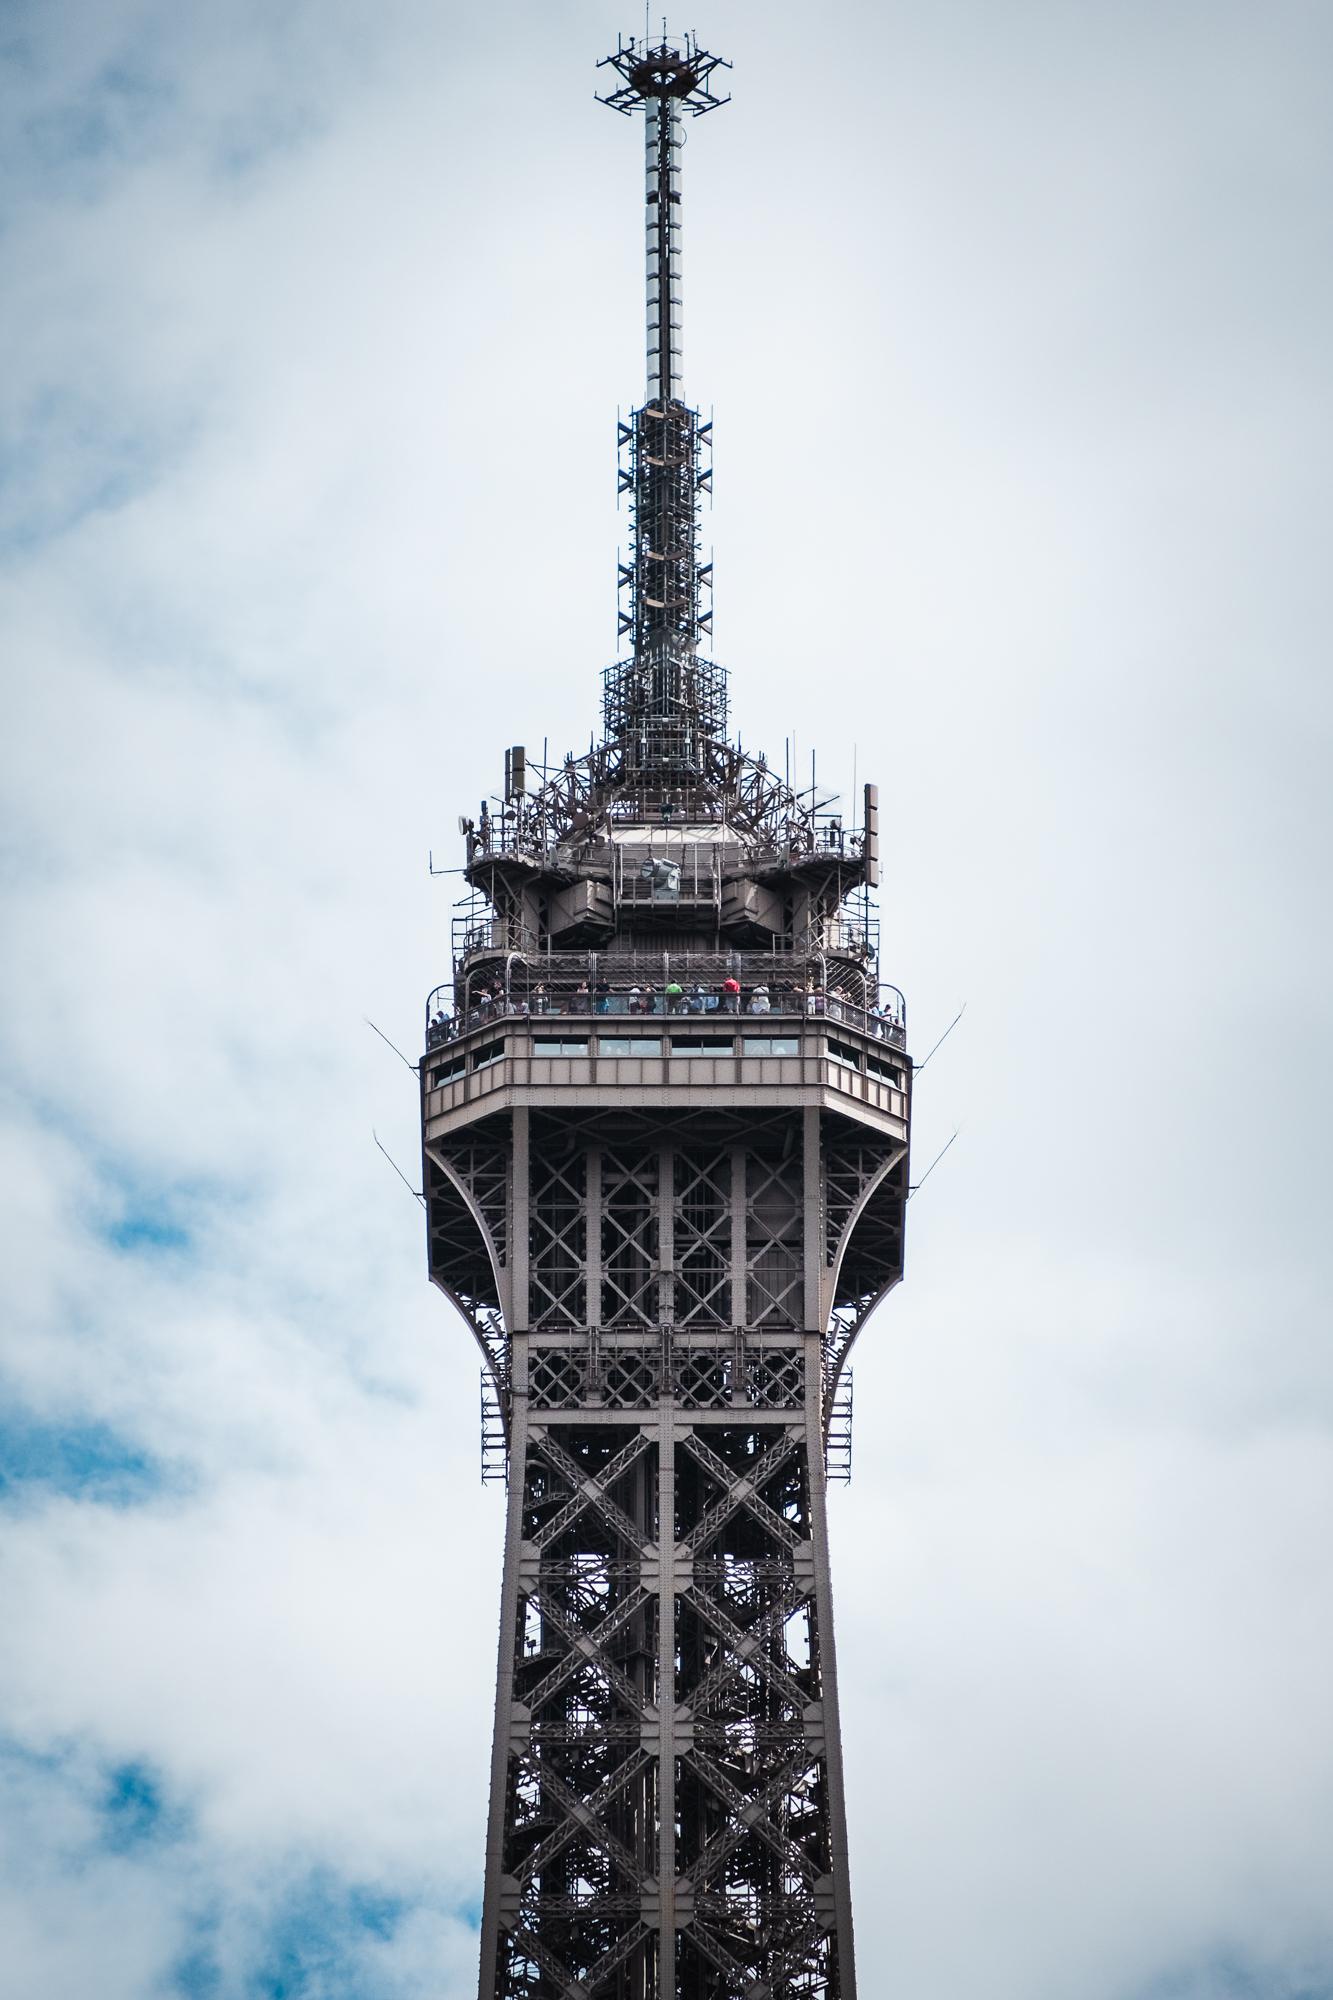 TS -180731 - Paris - 027.jpg